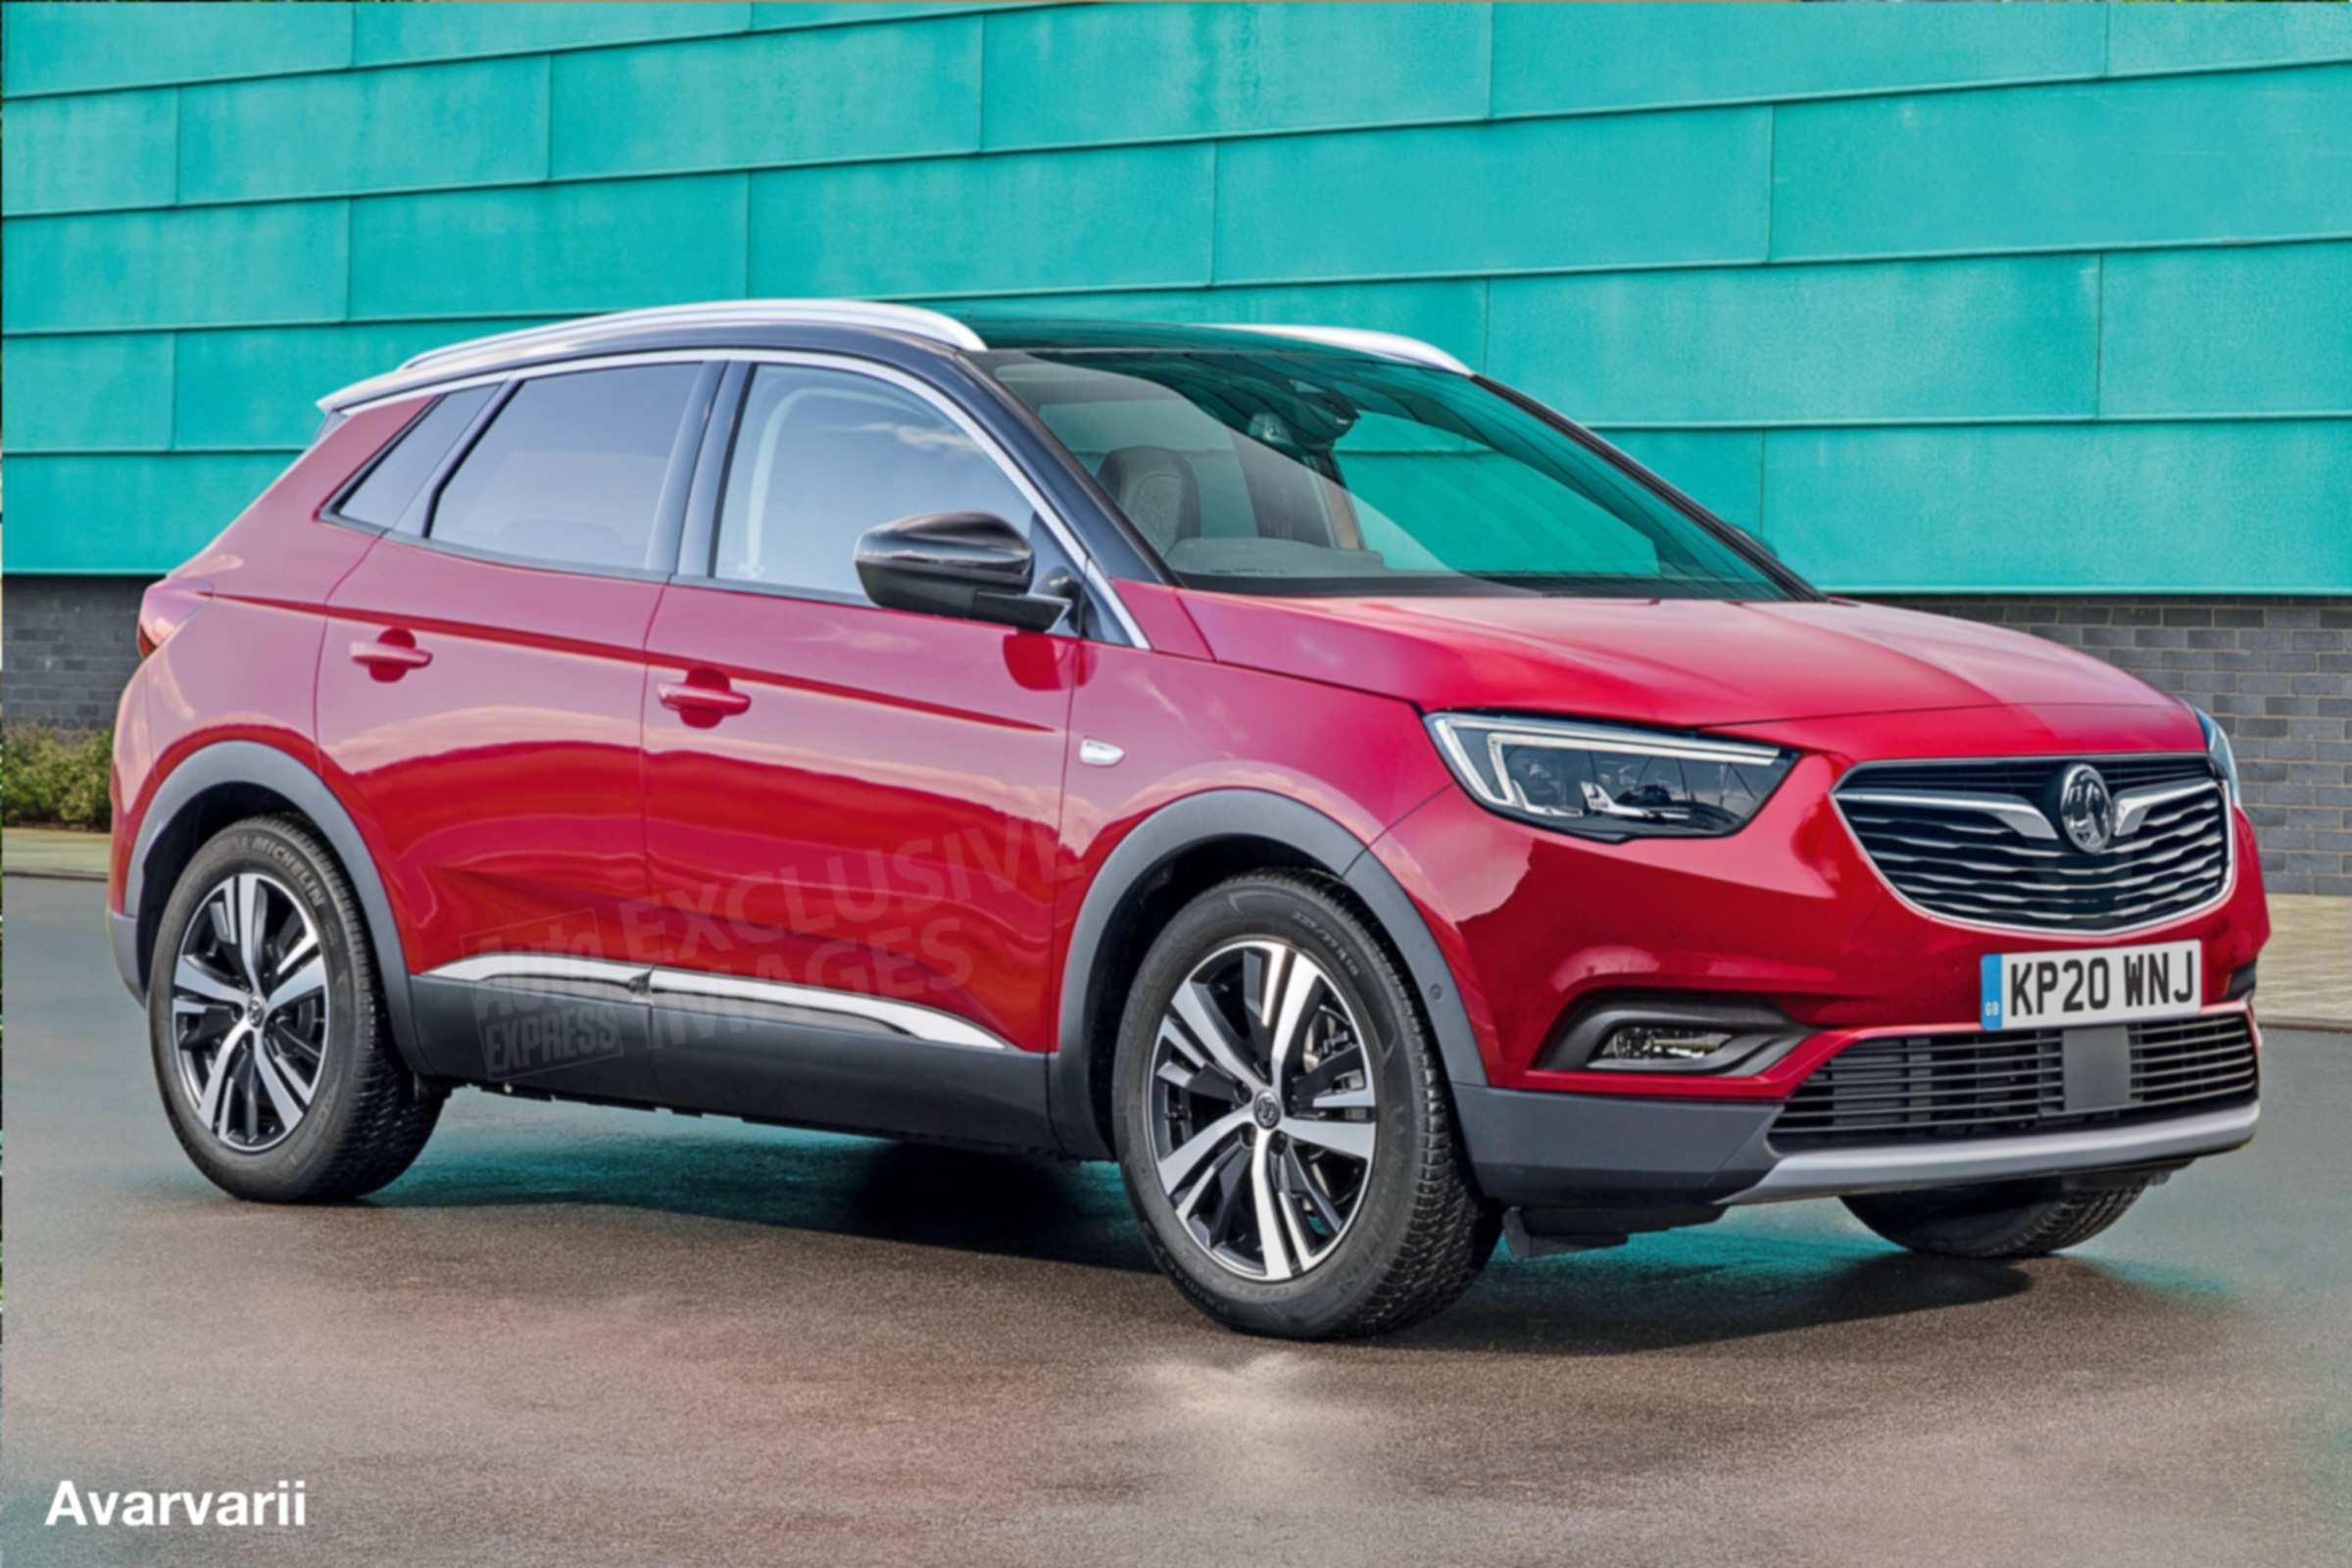 16 New 2019 Opel Suv History with 2019 Opel Suv